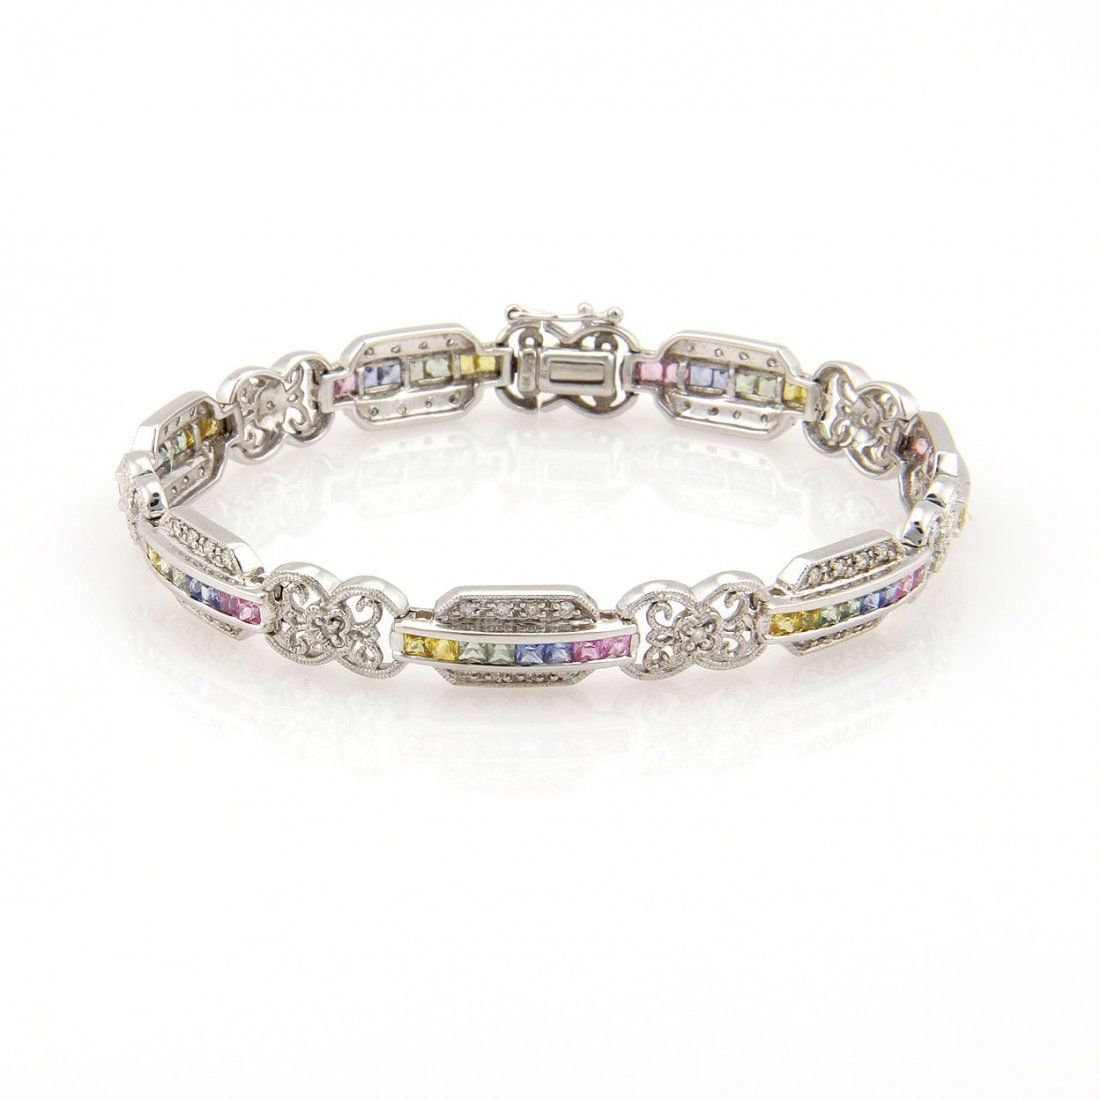 Estate 14K White Gold Diamond & Rainbow Sapphire Link